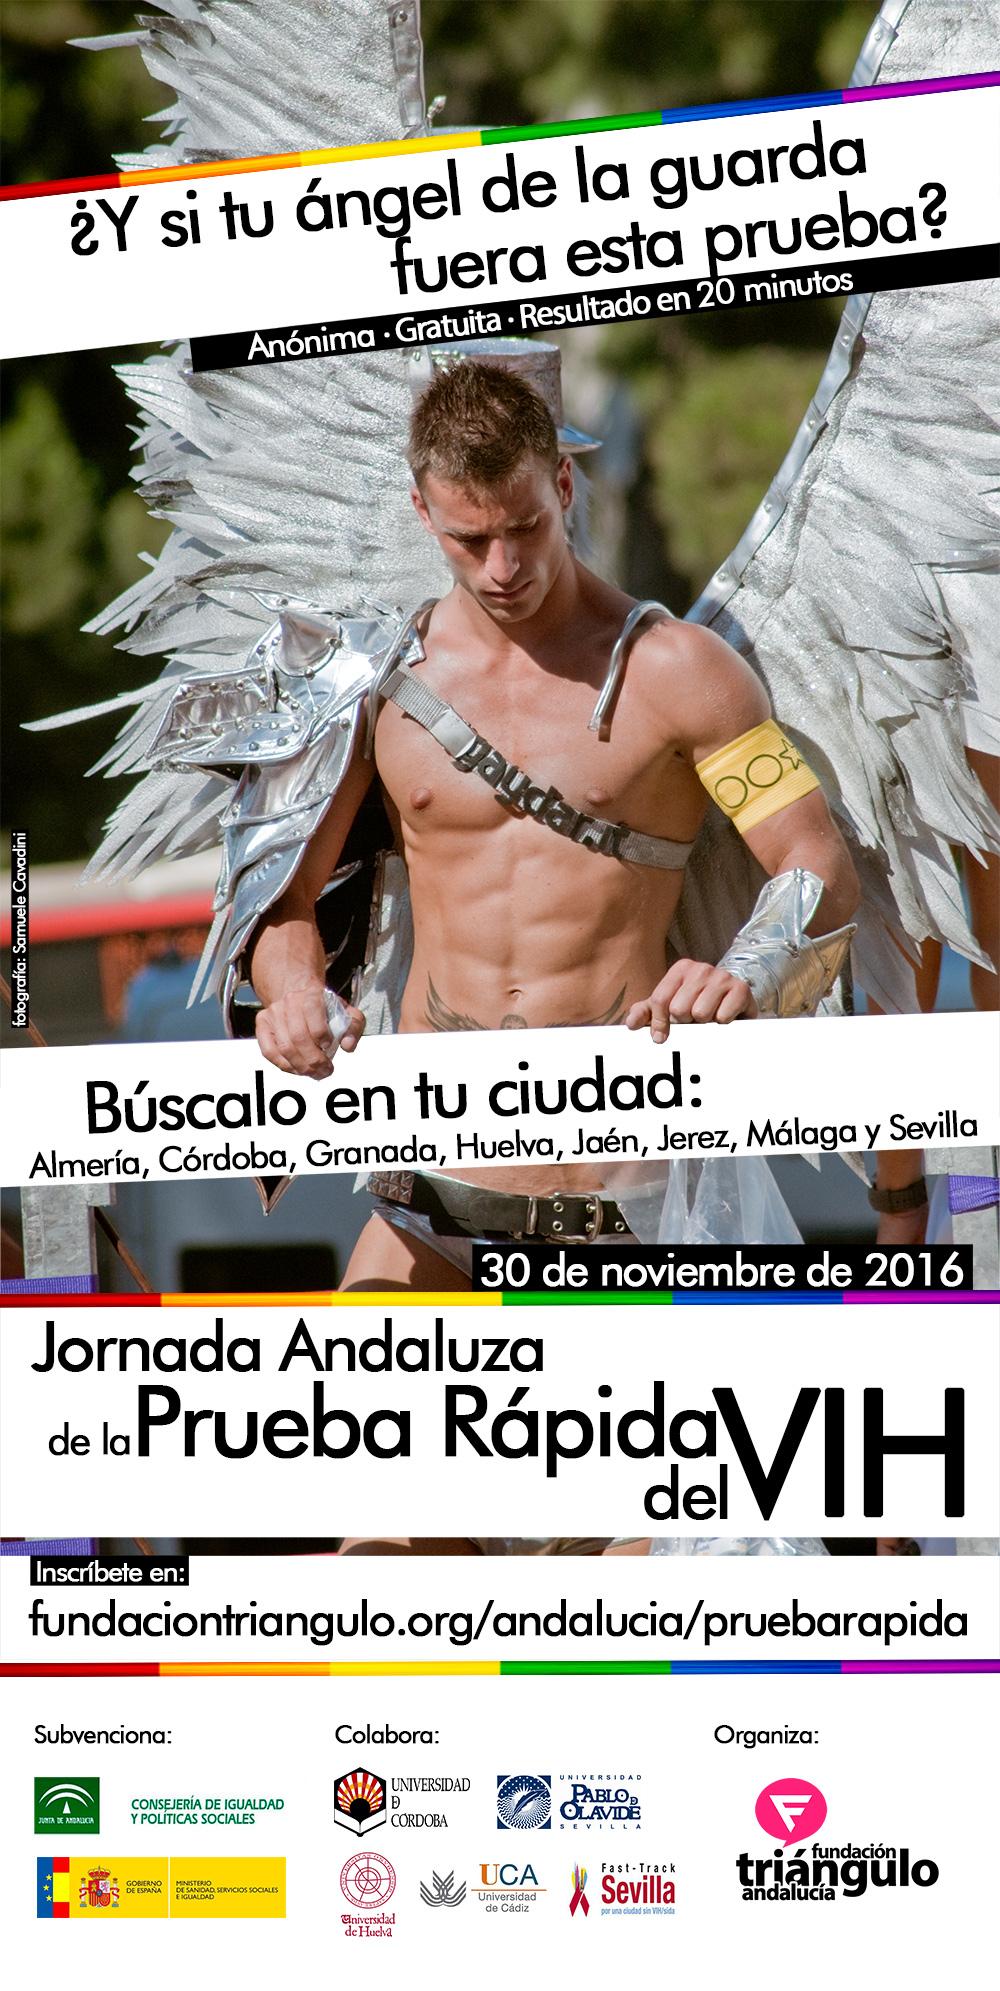 Prueba rápida VIH Andalucía